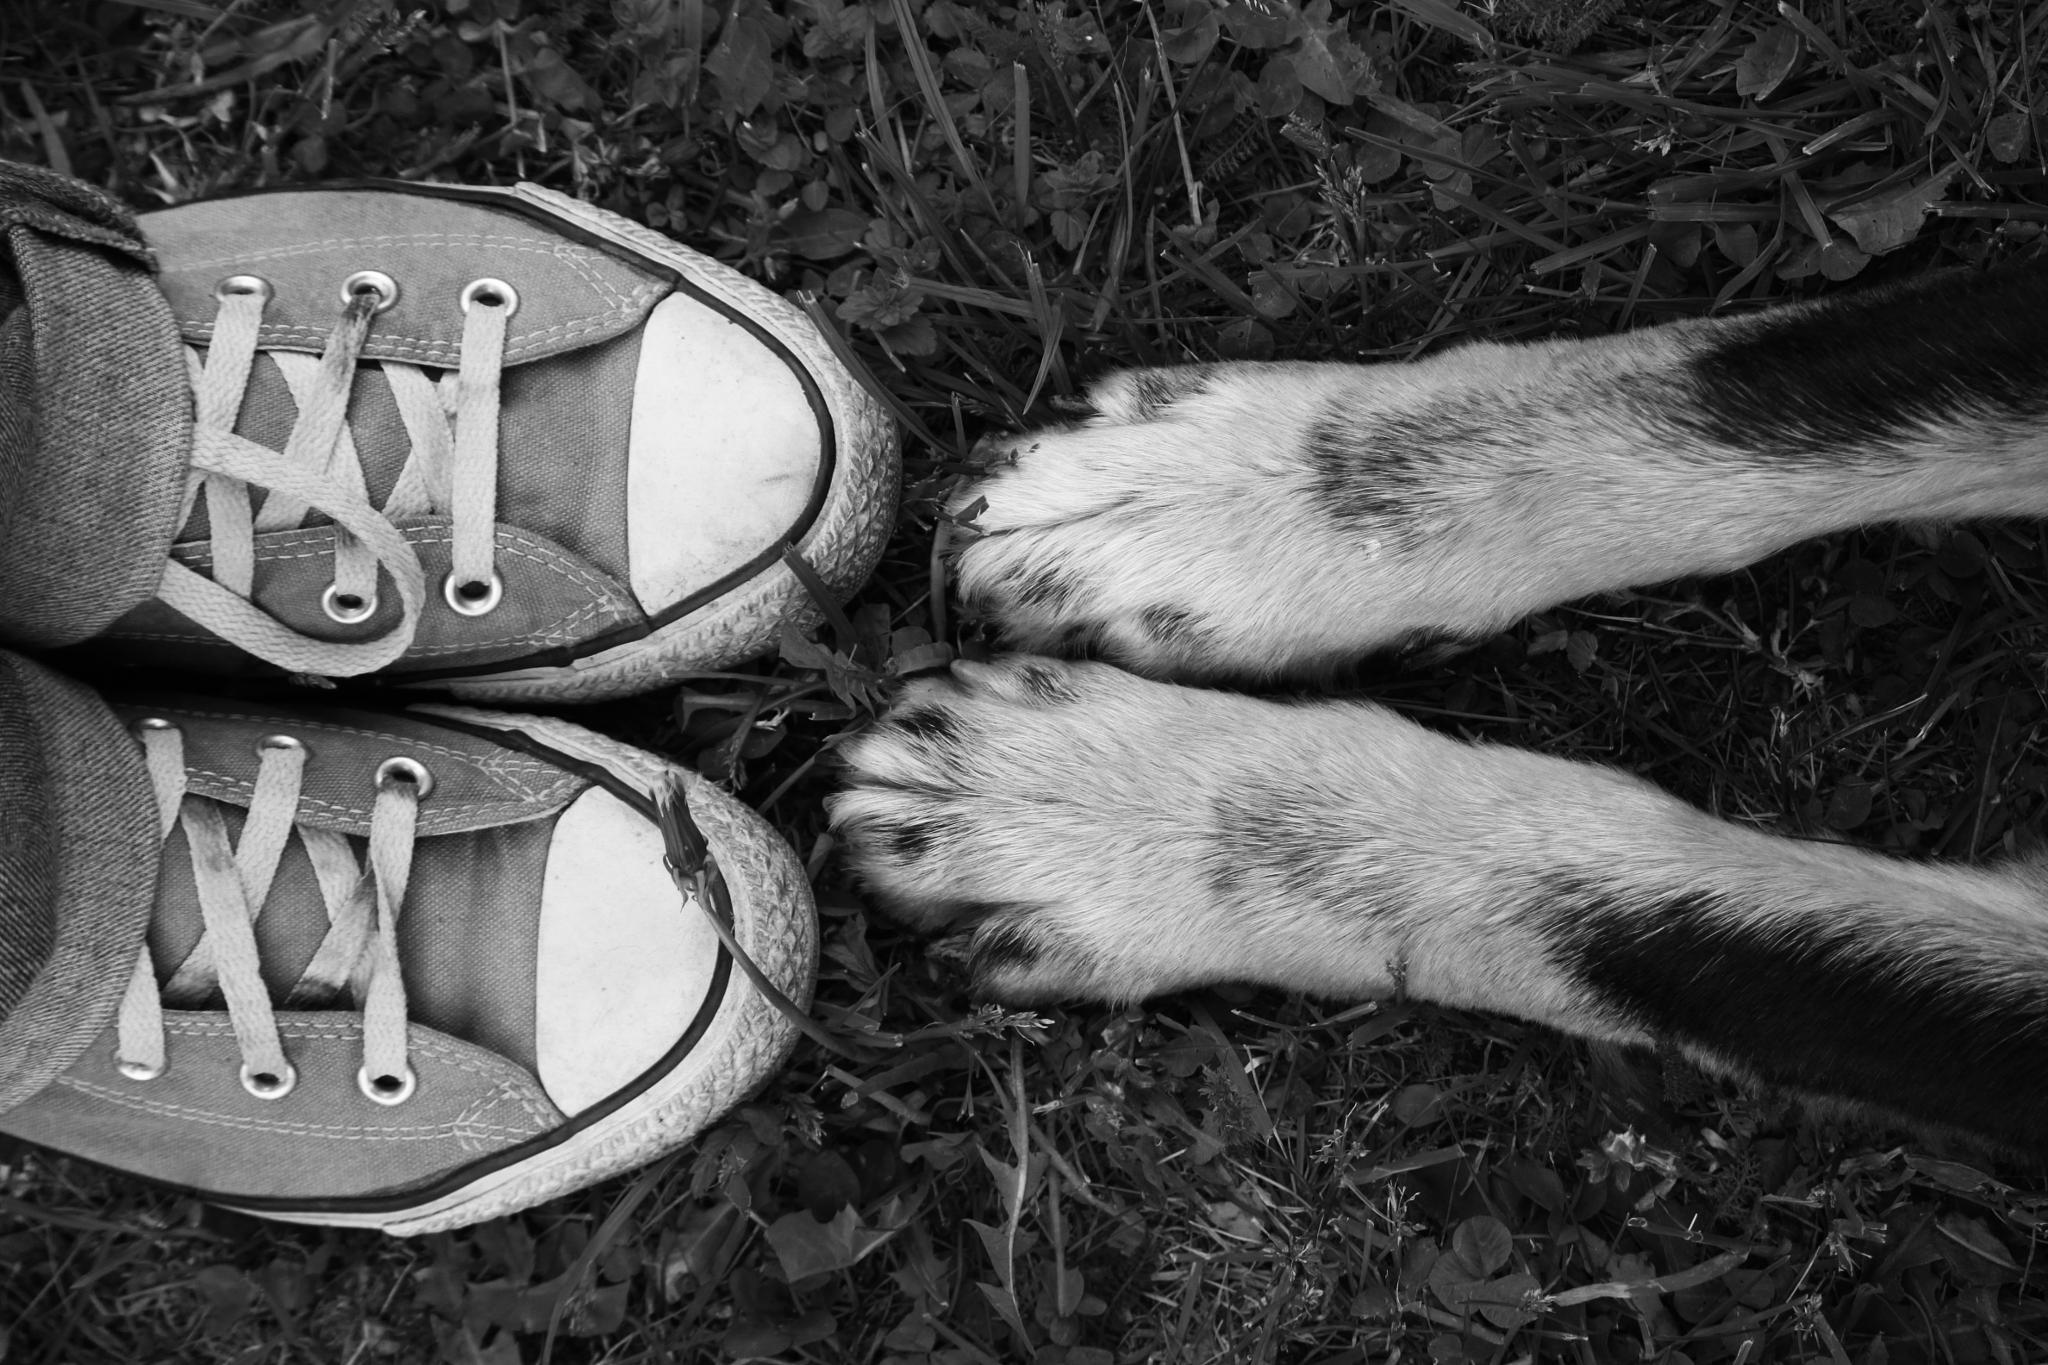 friendship story by lenka samardzic